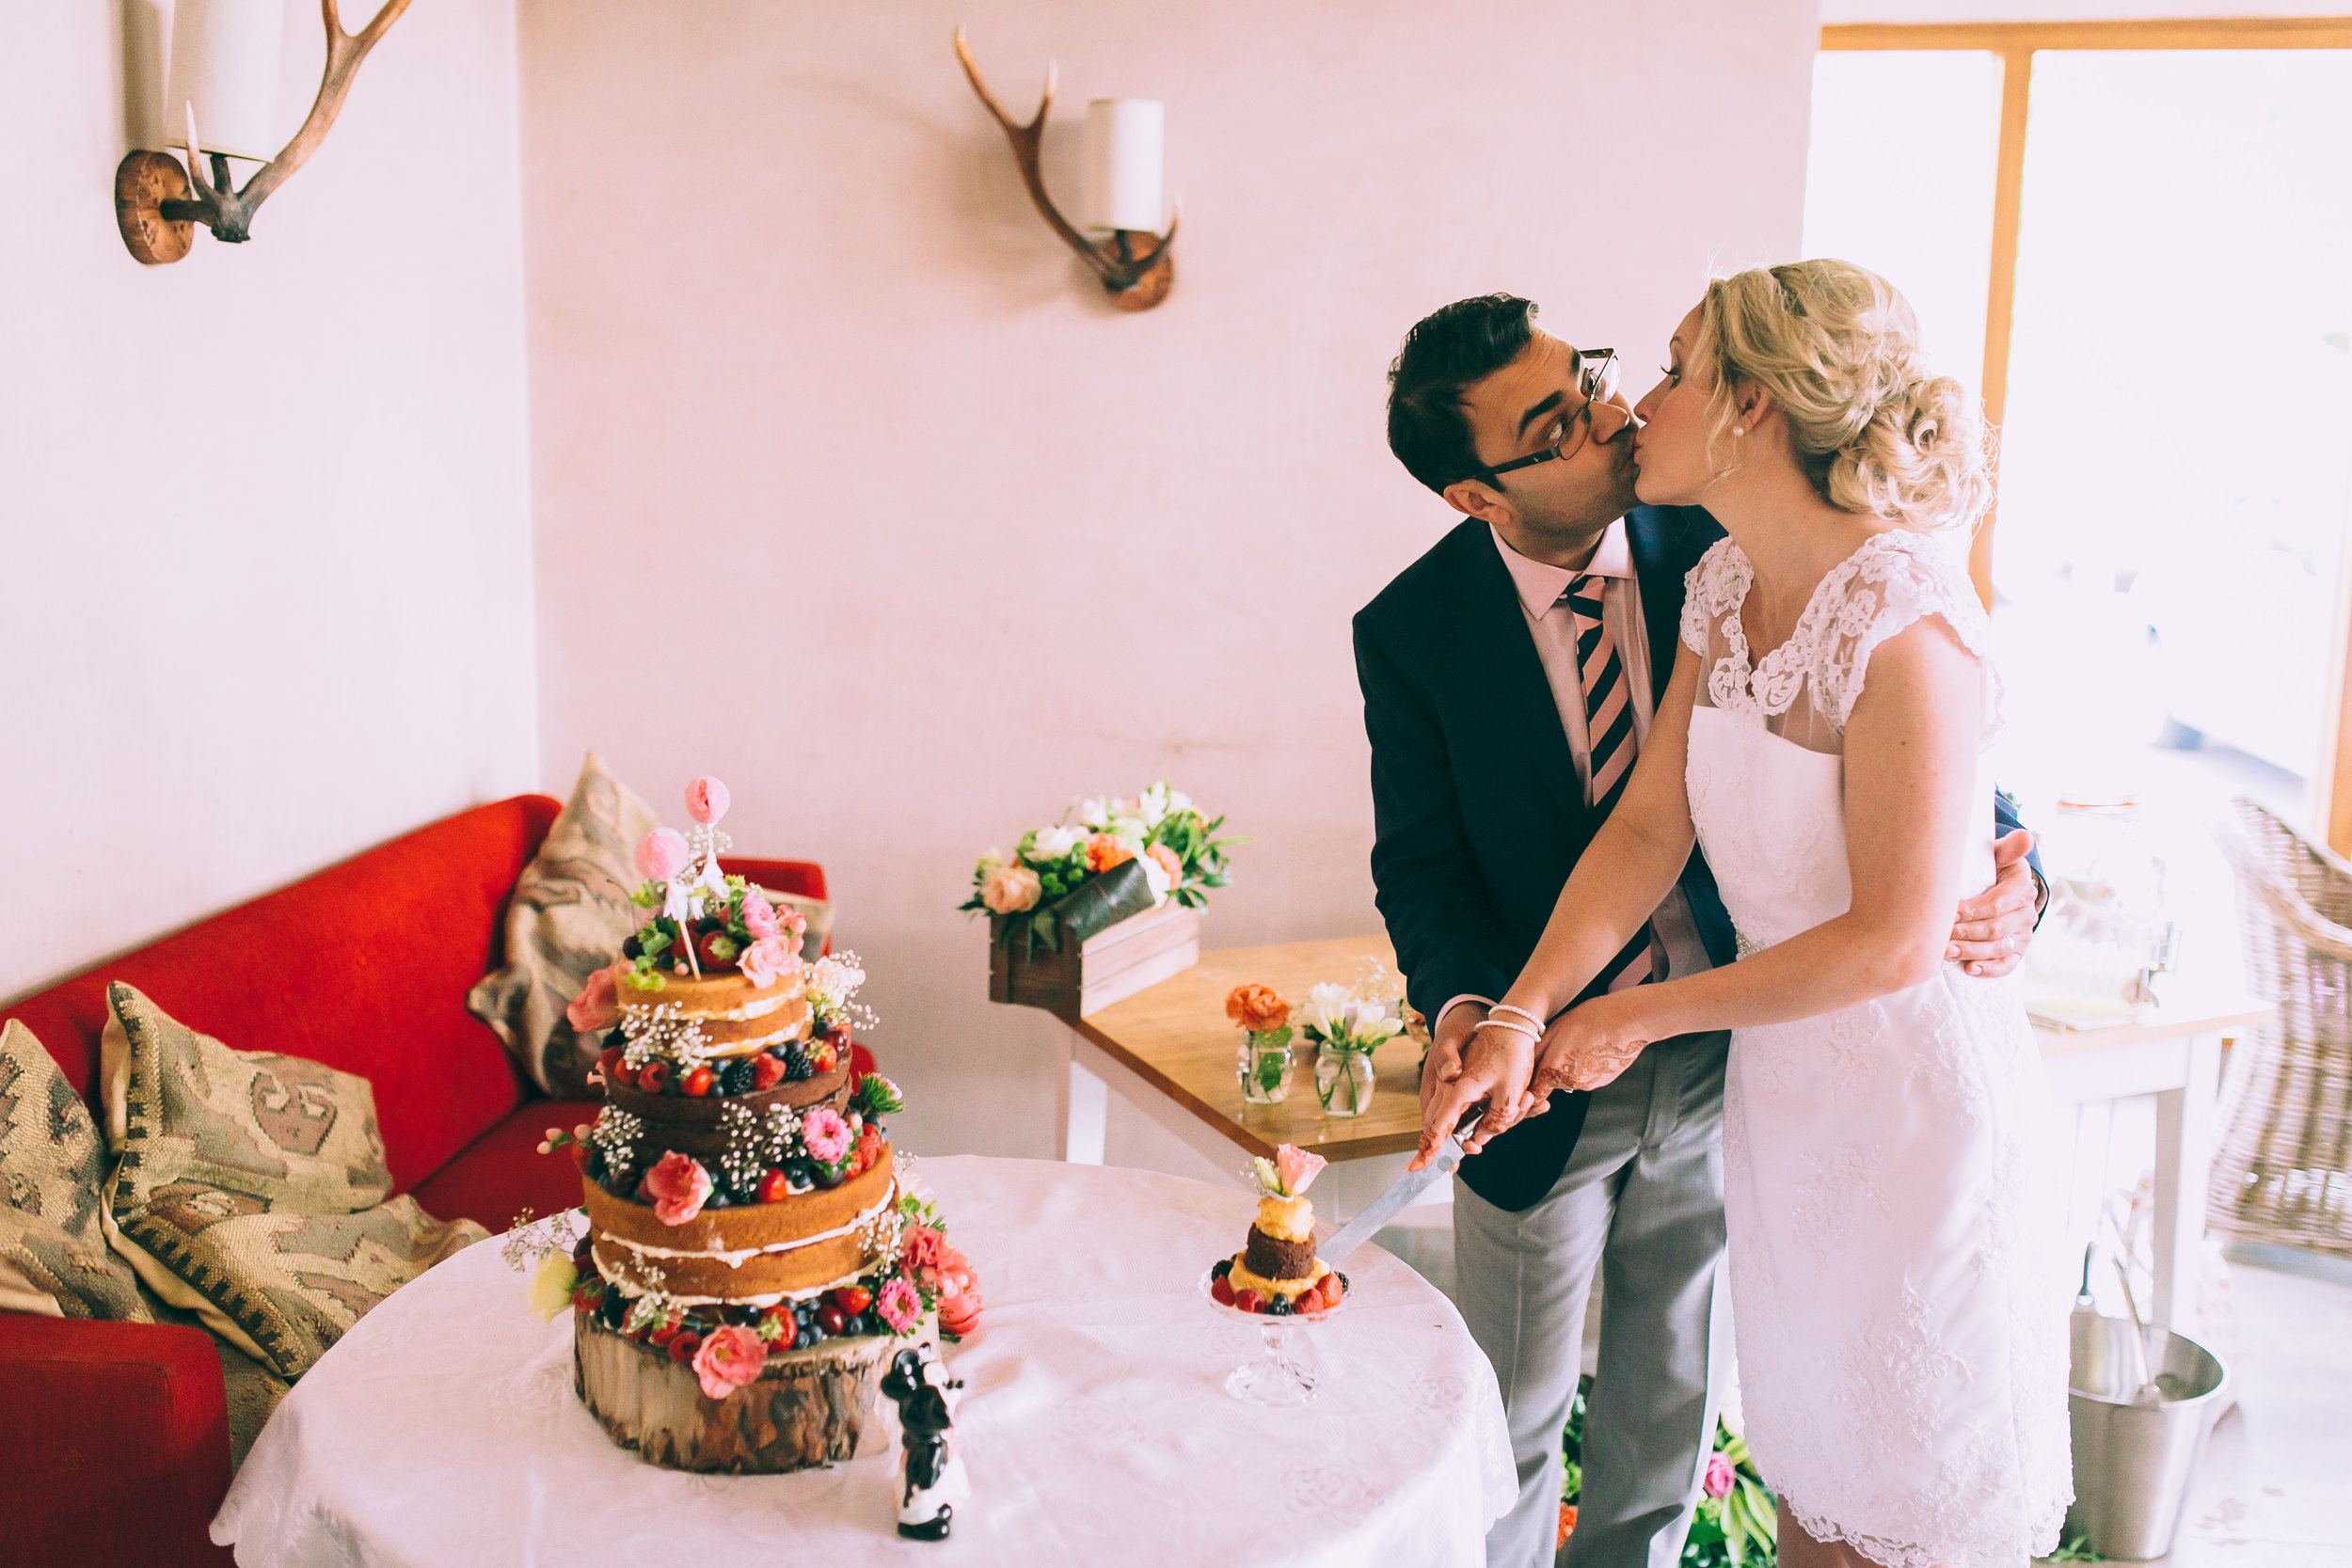 Nish&Emma-DAYFOUR-Wedding-in-pointing-dog-cheadle-tom-biddle-photography-tb217.jpg